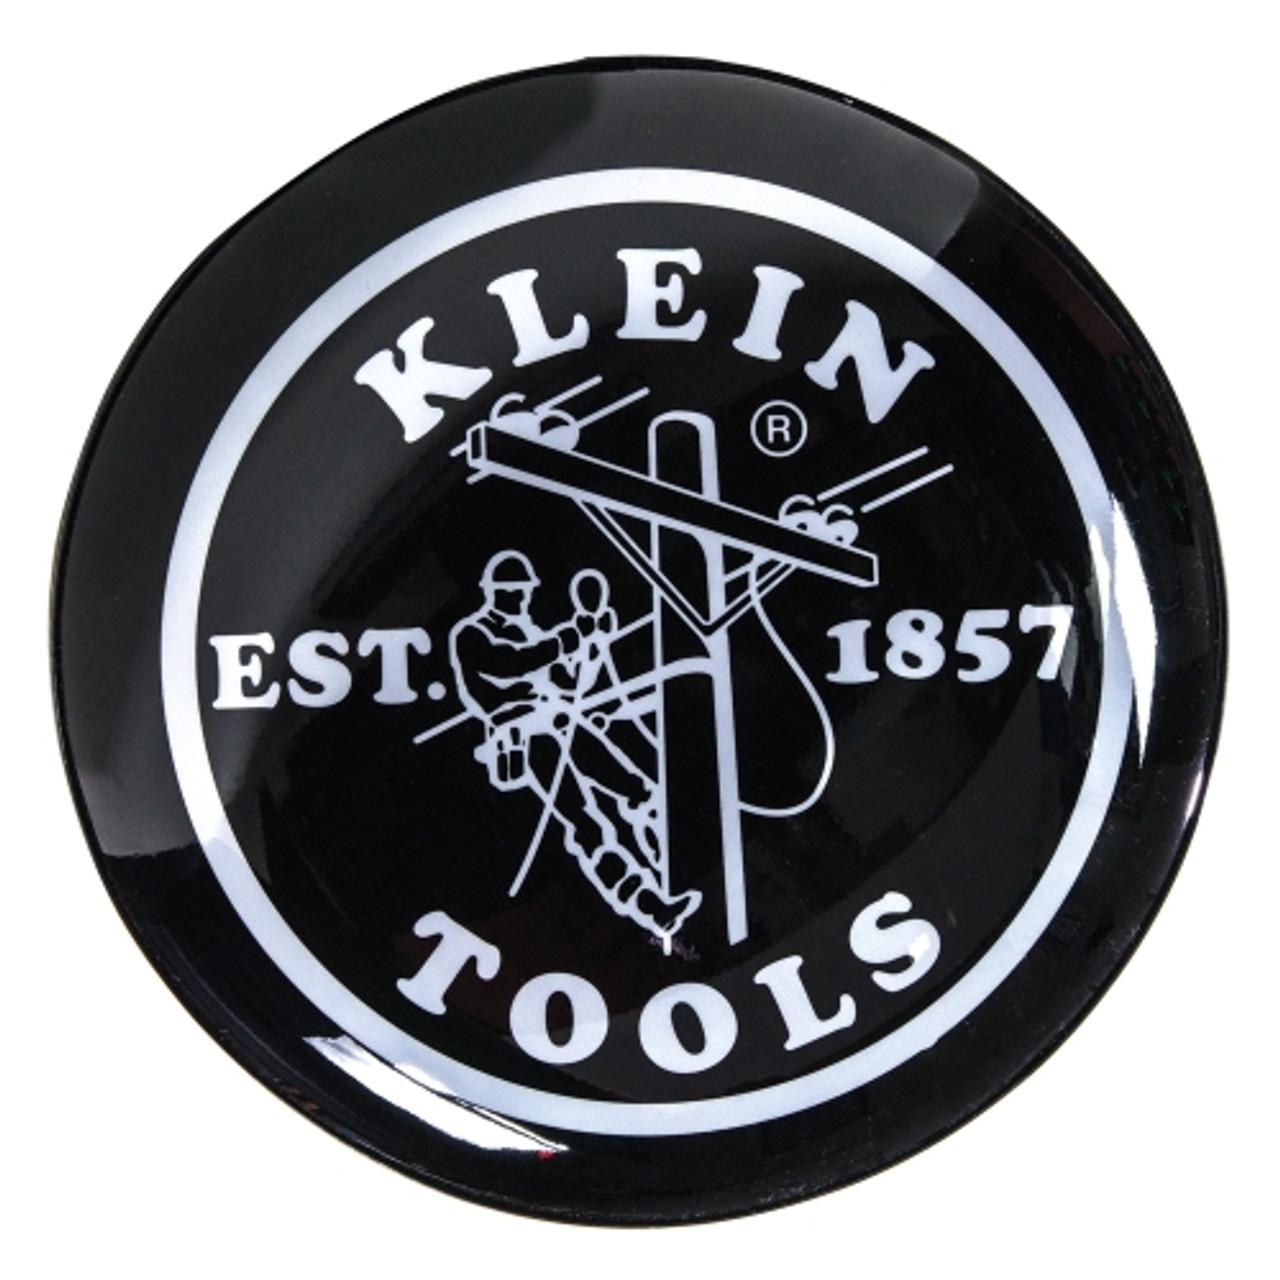 Klein MBD00111 Counter Stool